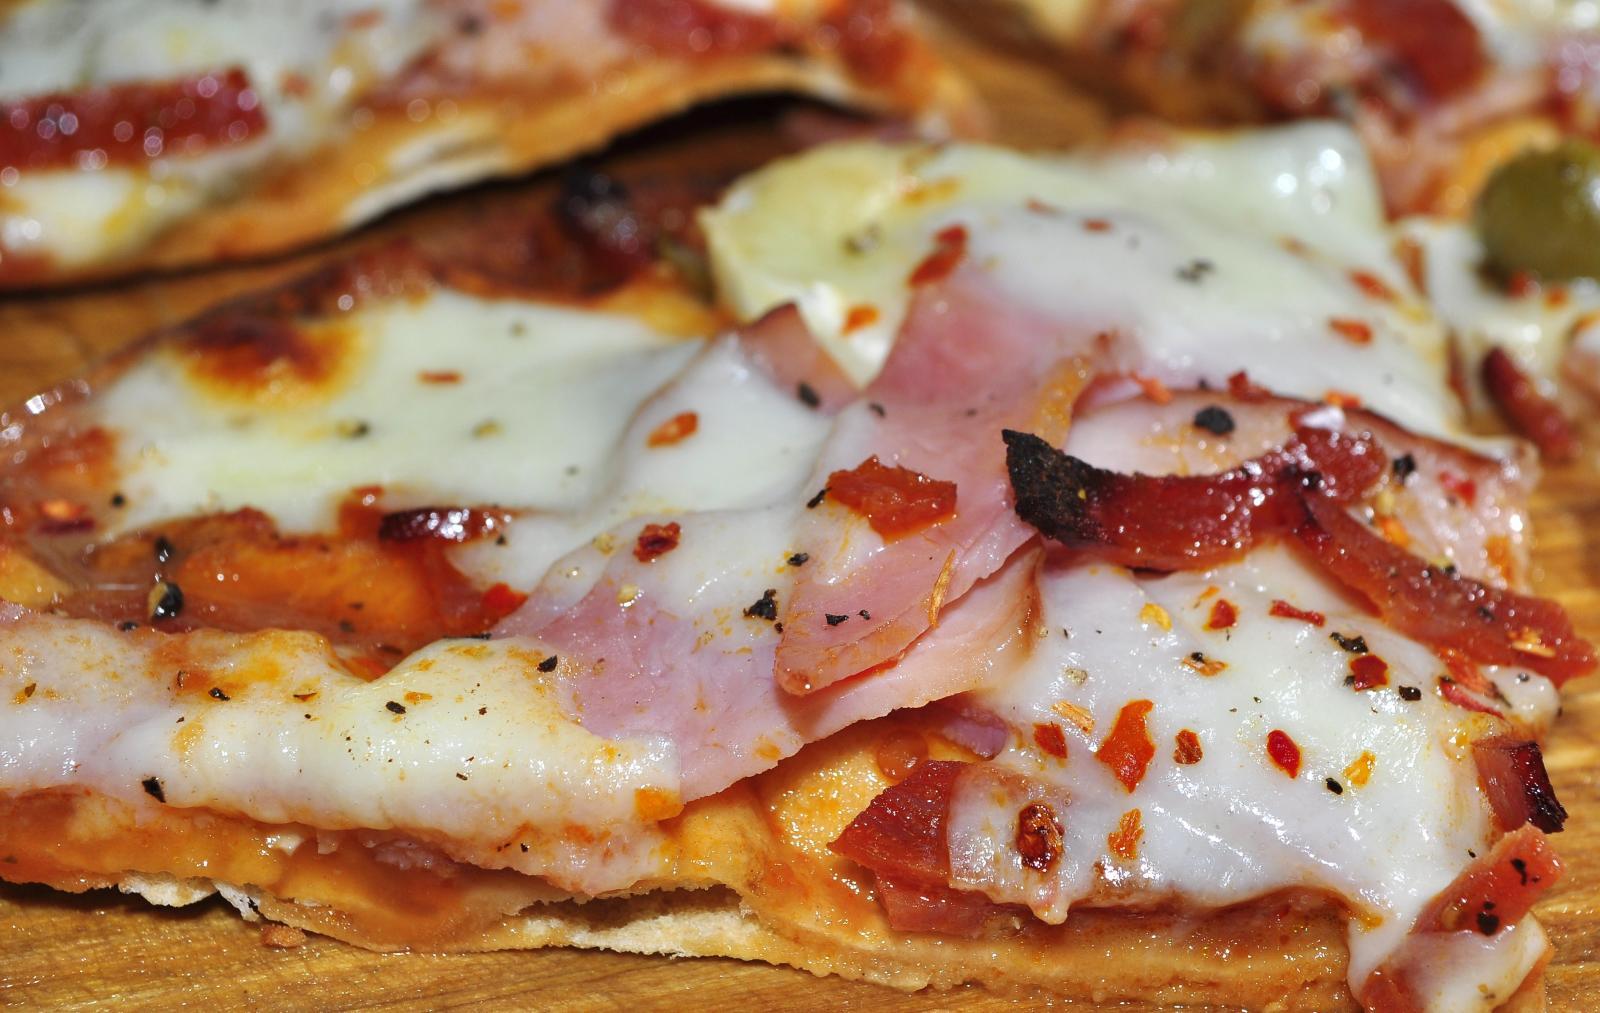 Pita_pizza_jeffreyw CC wikicommons